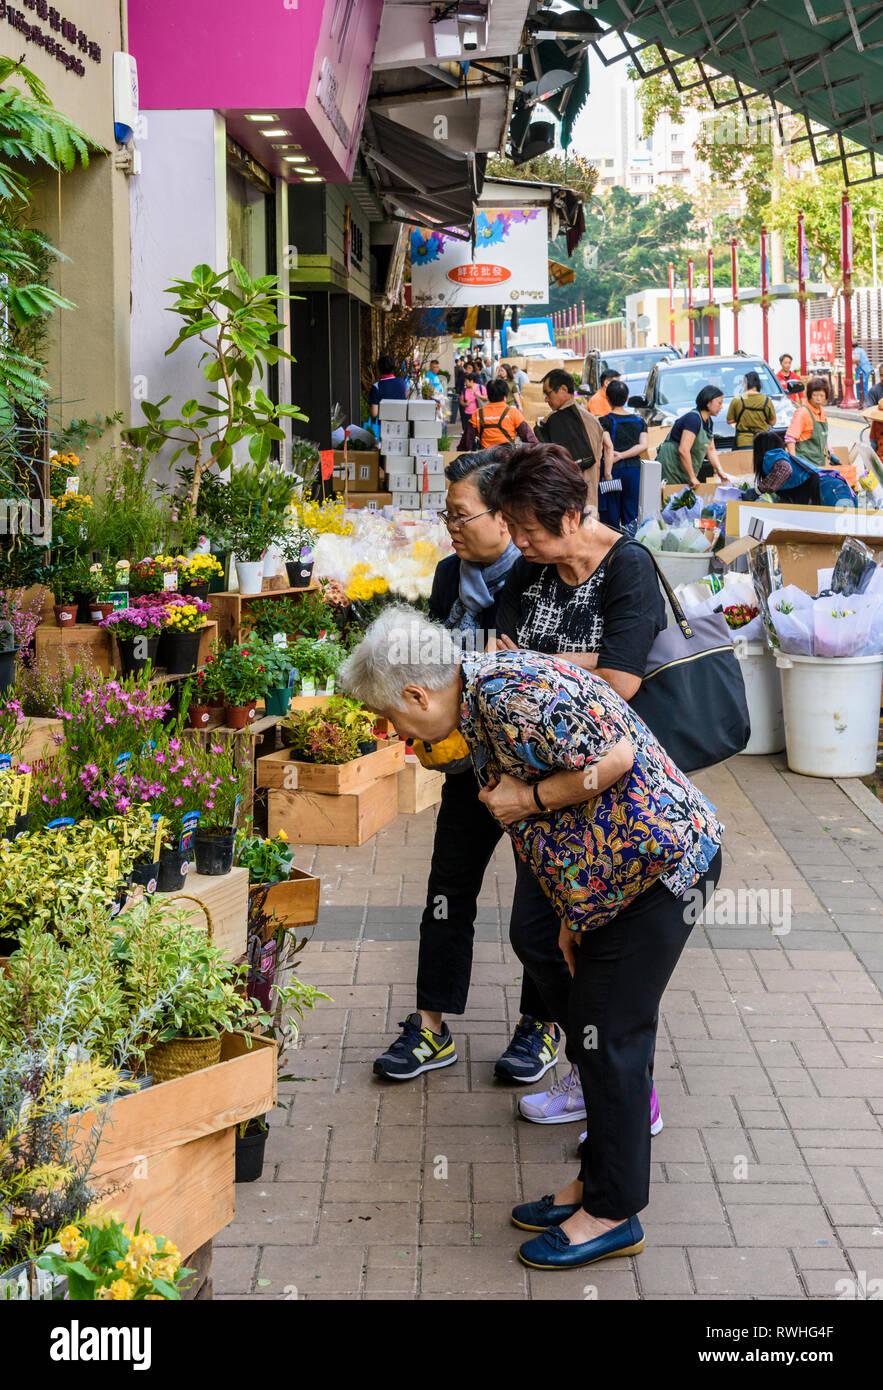 Locals shop along Flower Market Road, Kowloon, Hong Kong - Stock Image